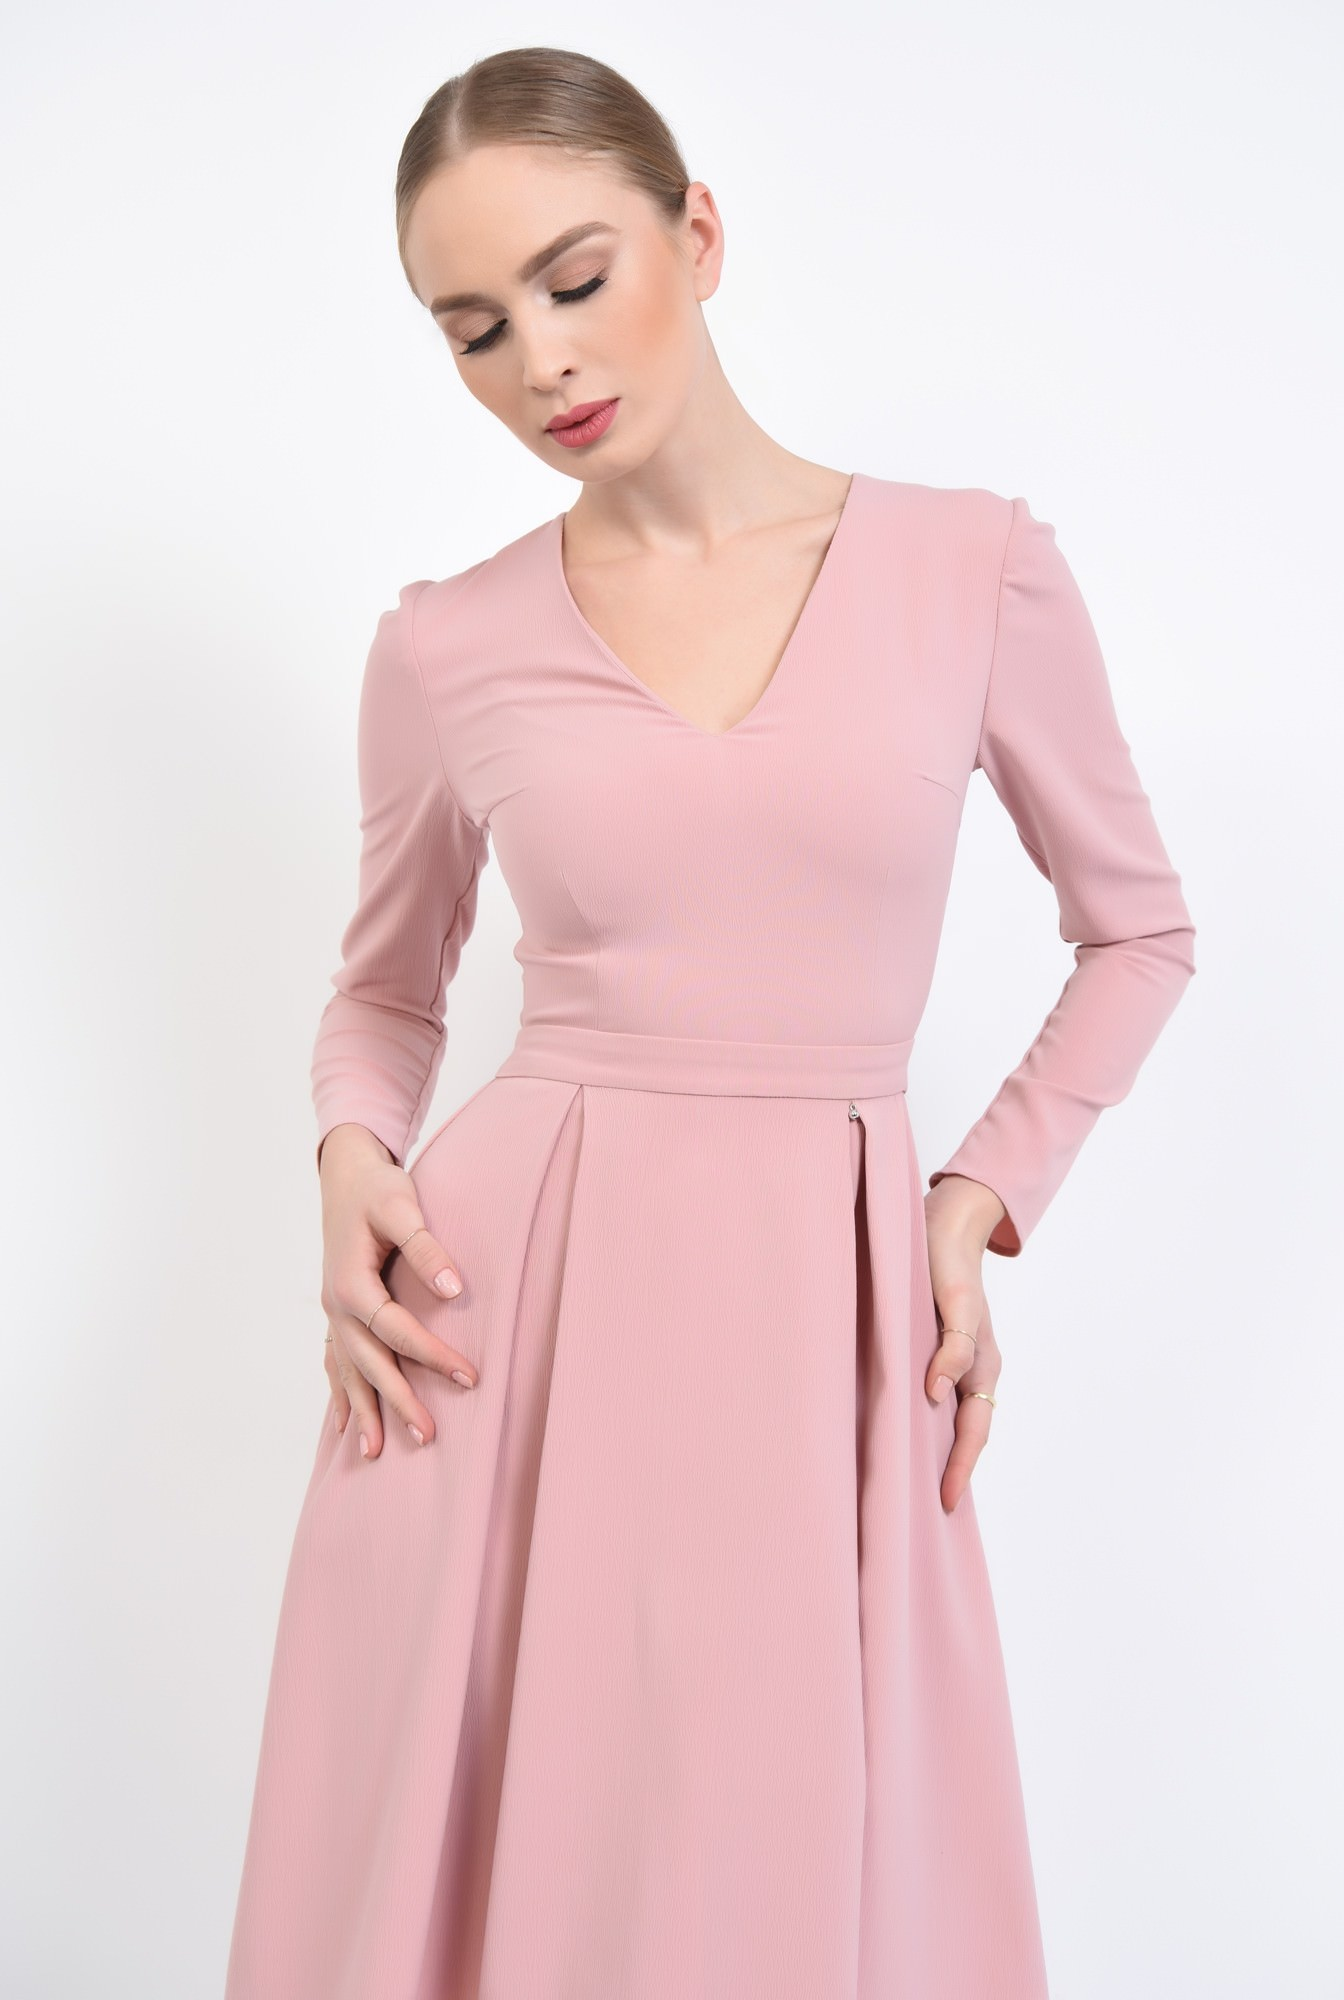 2 - Rochie de zi evazata, roz